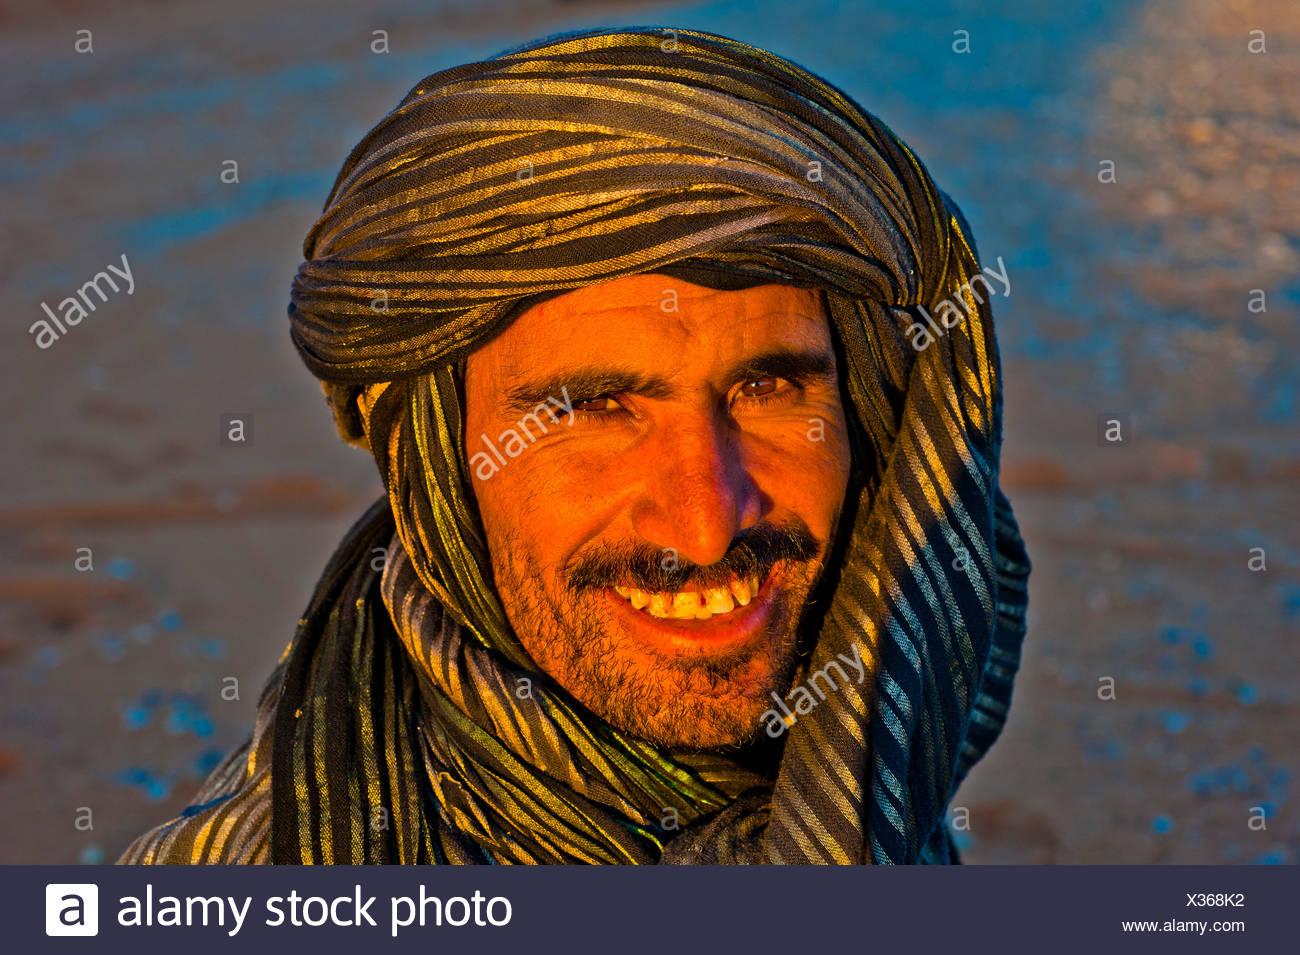 dating a berber man